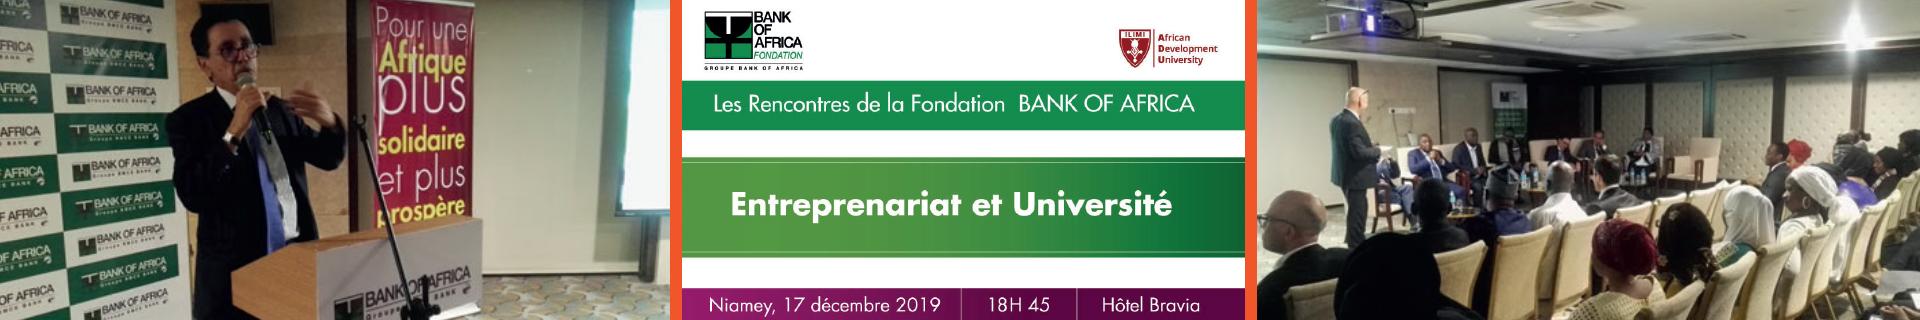 BANK OF AFRICA Foundation meetings – Entrepreneurship and University